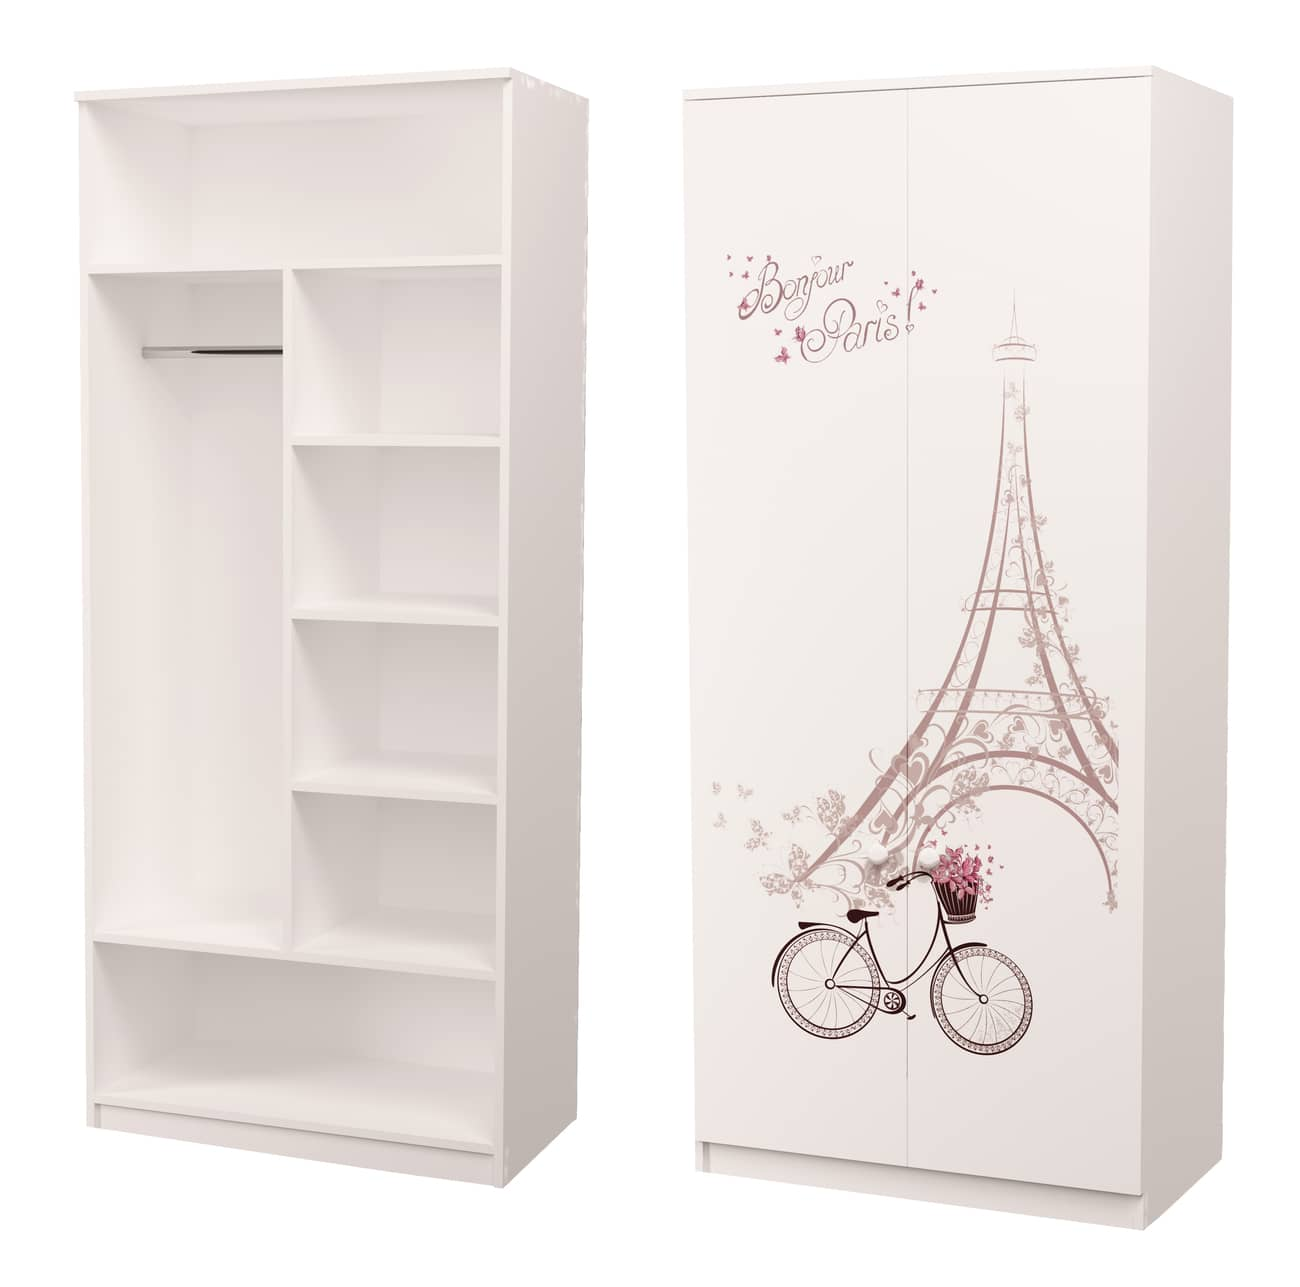 шкаф с рисунком и трубой париж